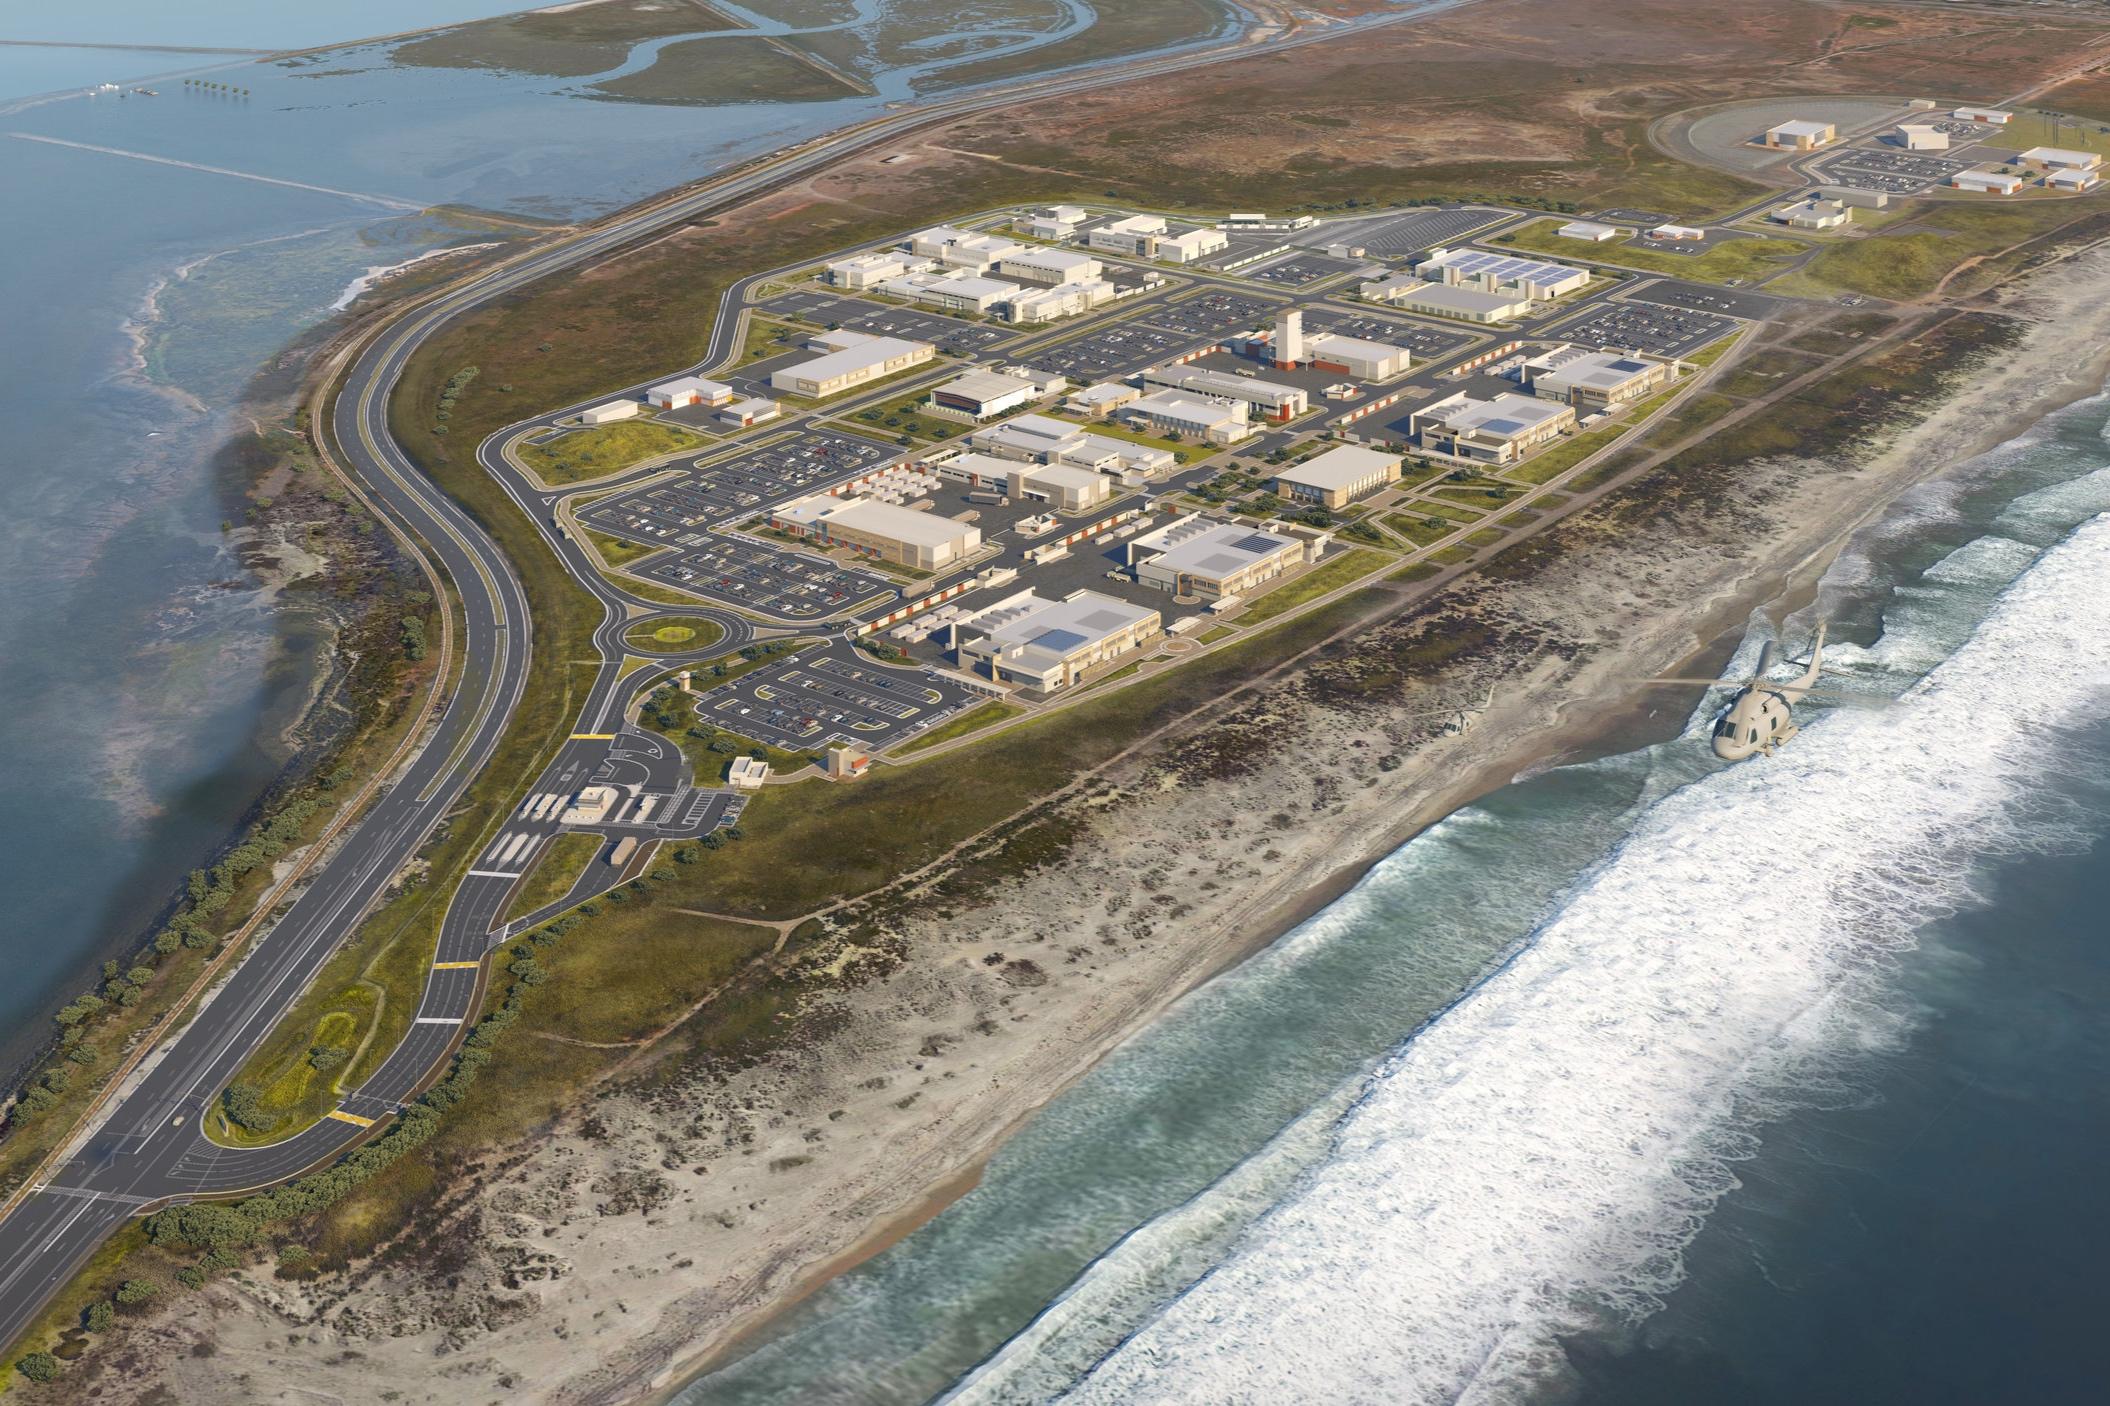 Silver Strand Campus Master Plan | U.S. Naval Special Warfare Command - San Diego, CA